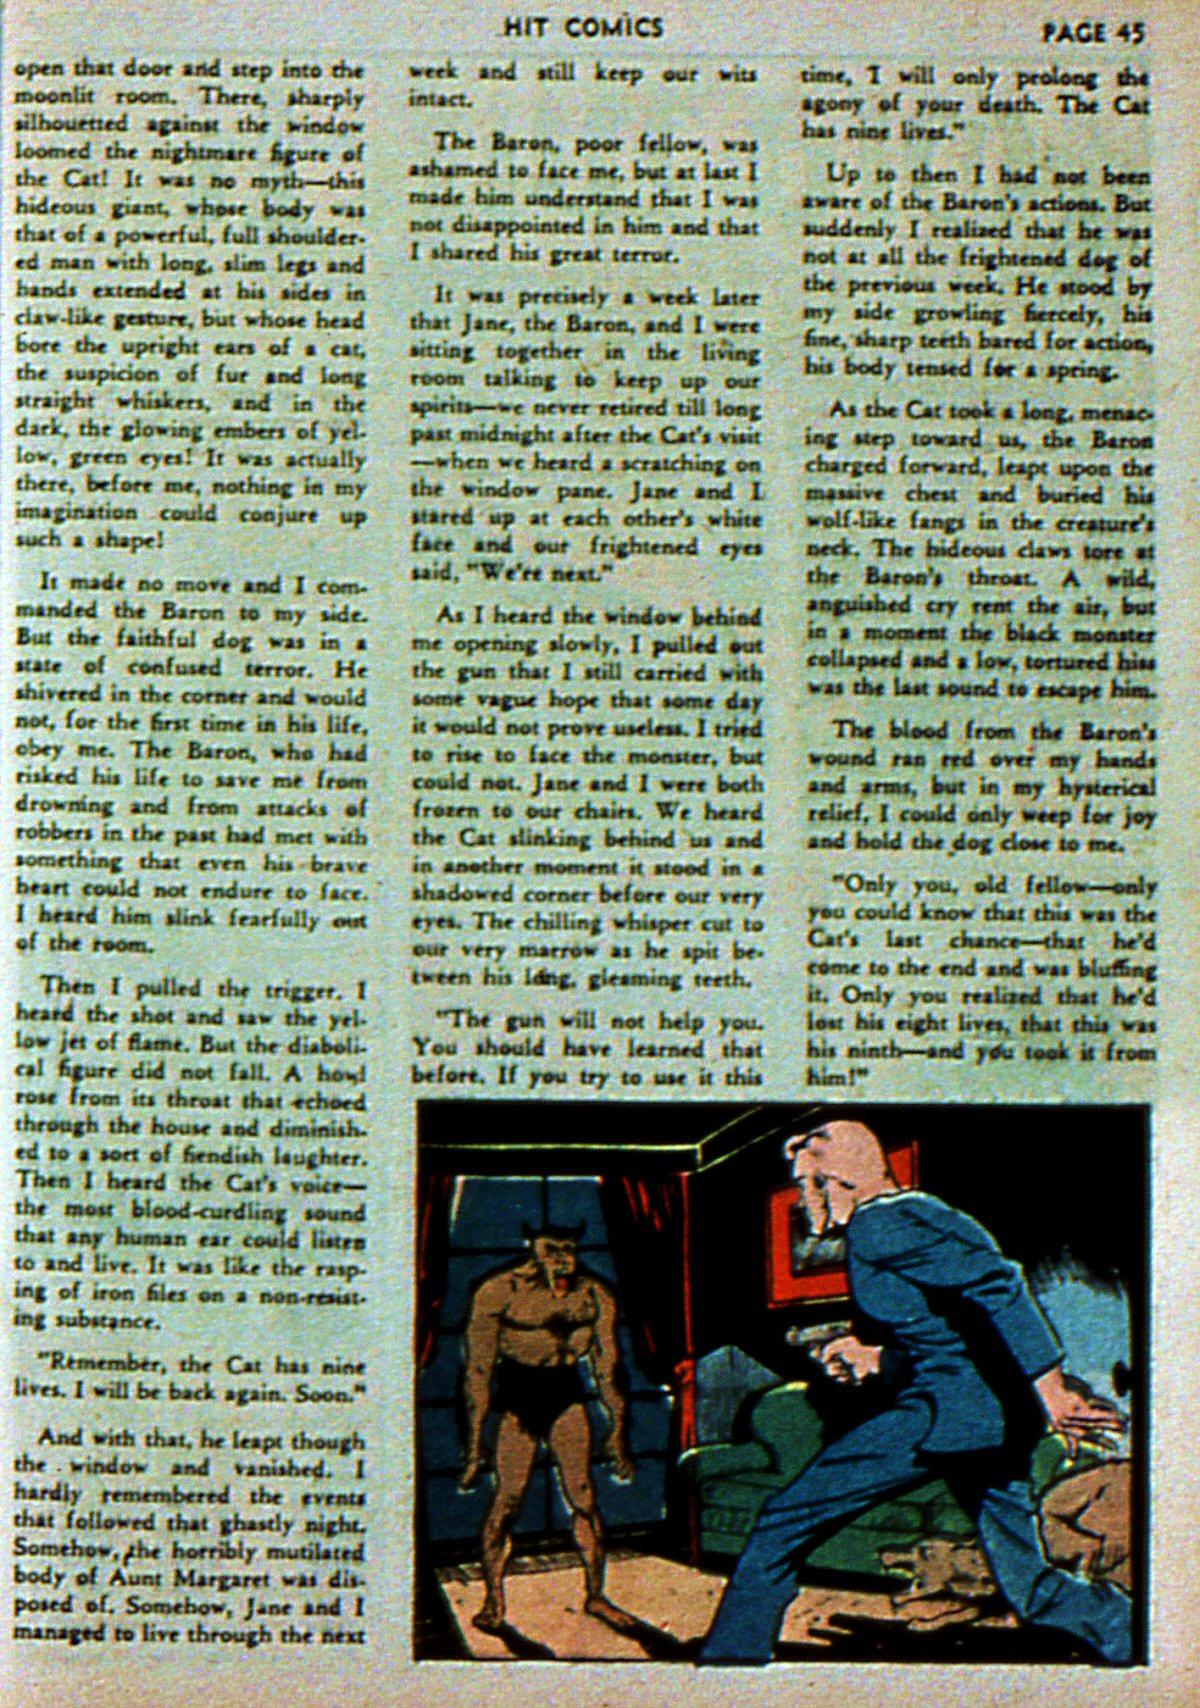 Read online Hit Comics comic -  Issue #3 - 47